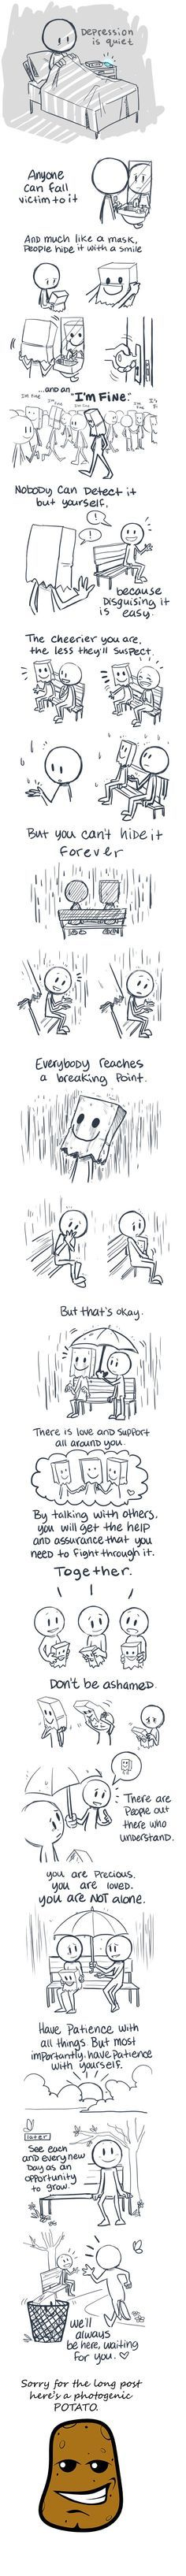 Depression #inspiration #cartoon